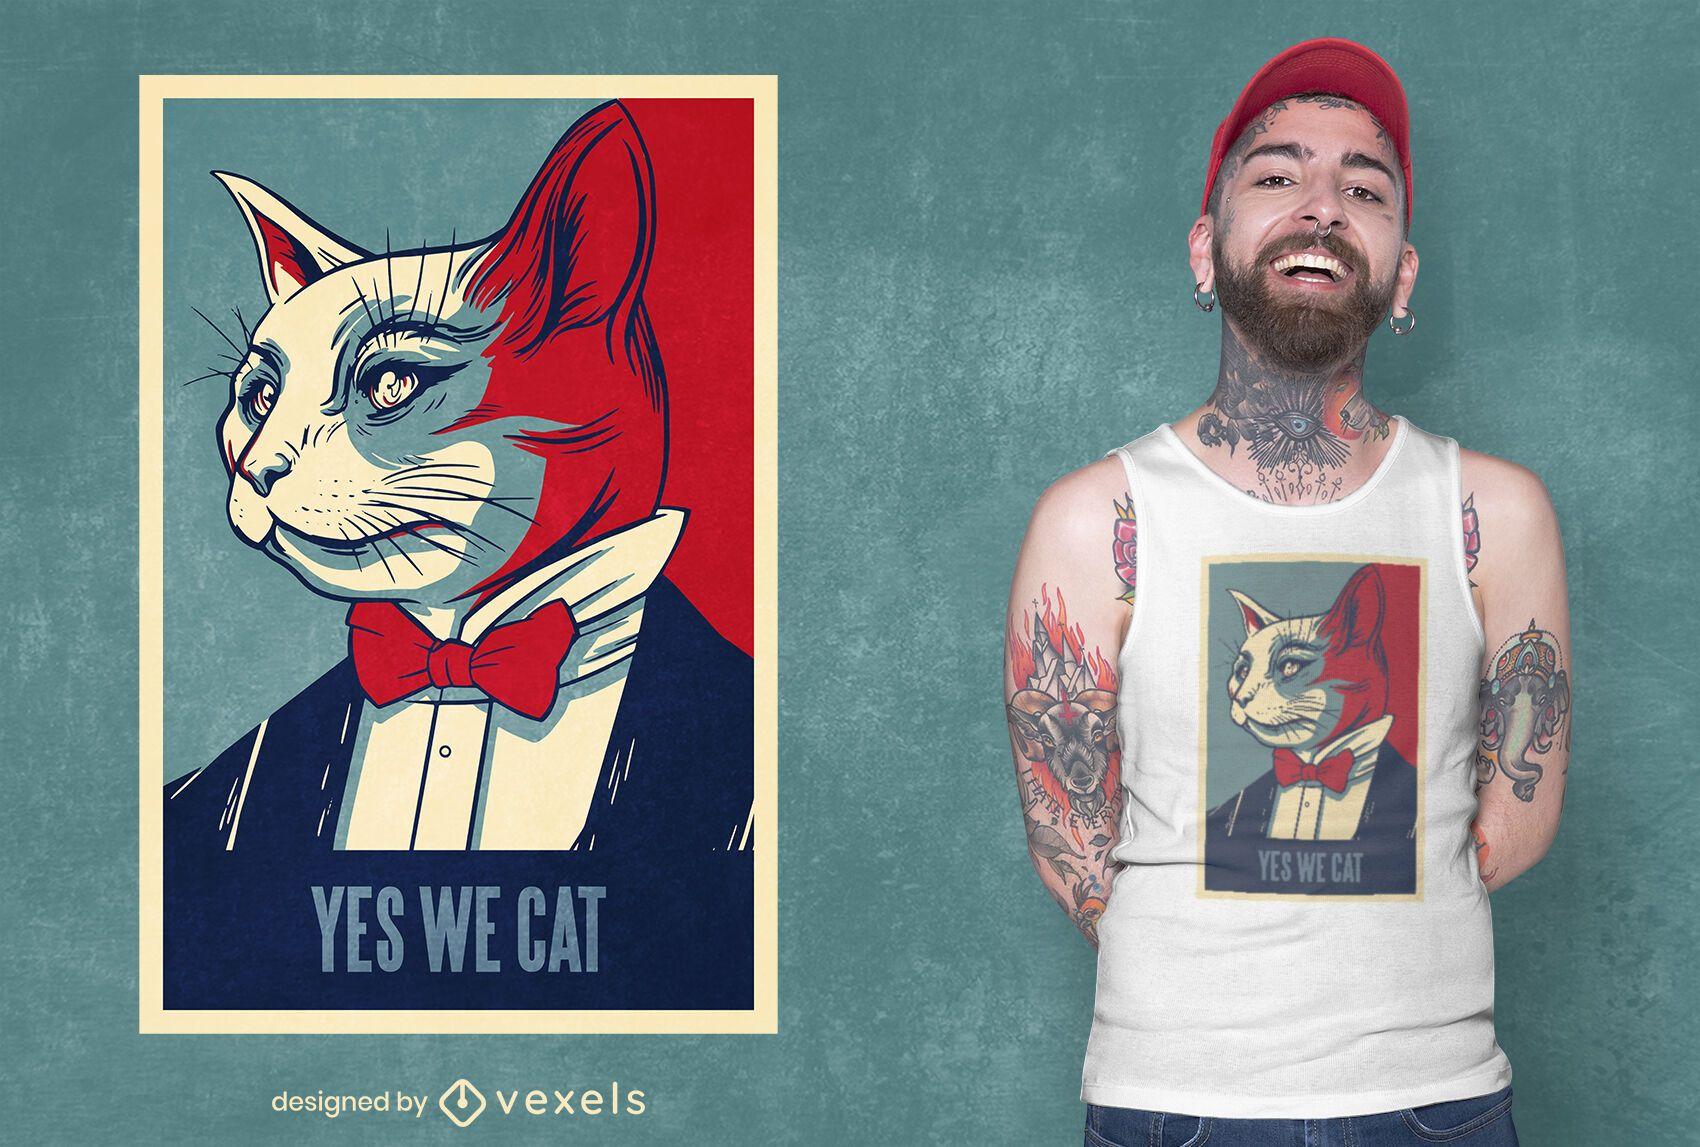 Yes we cat t-shirt design